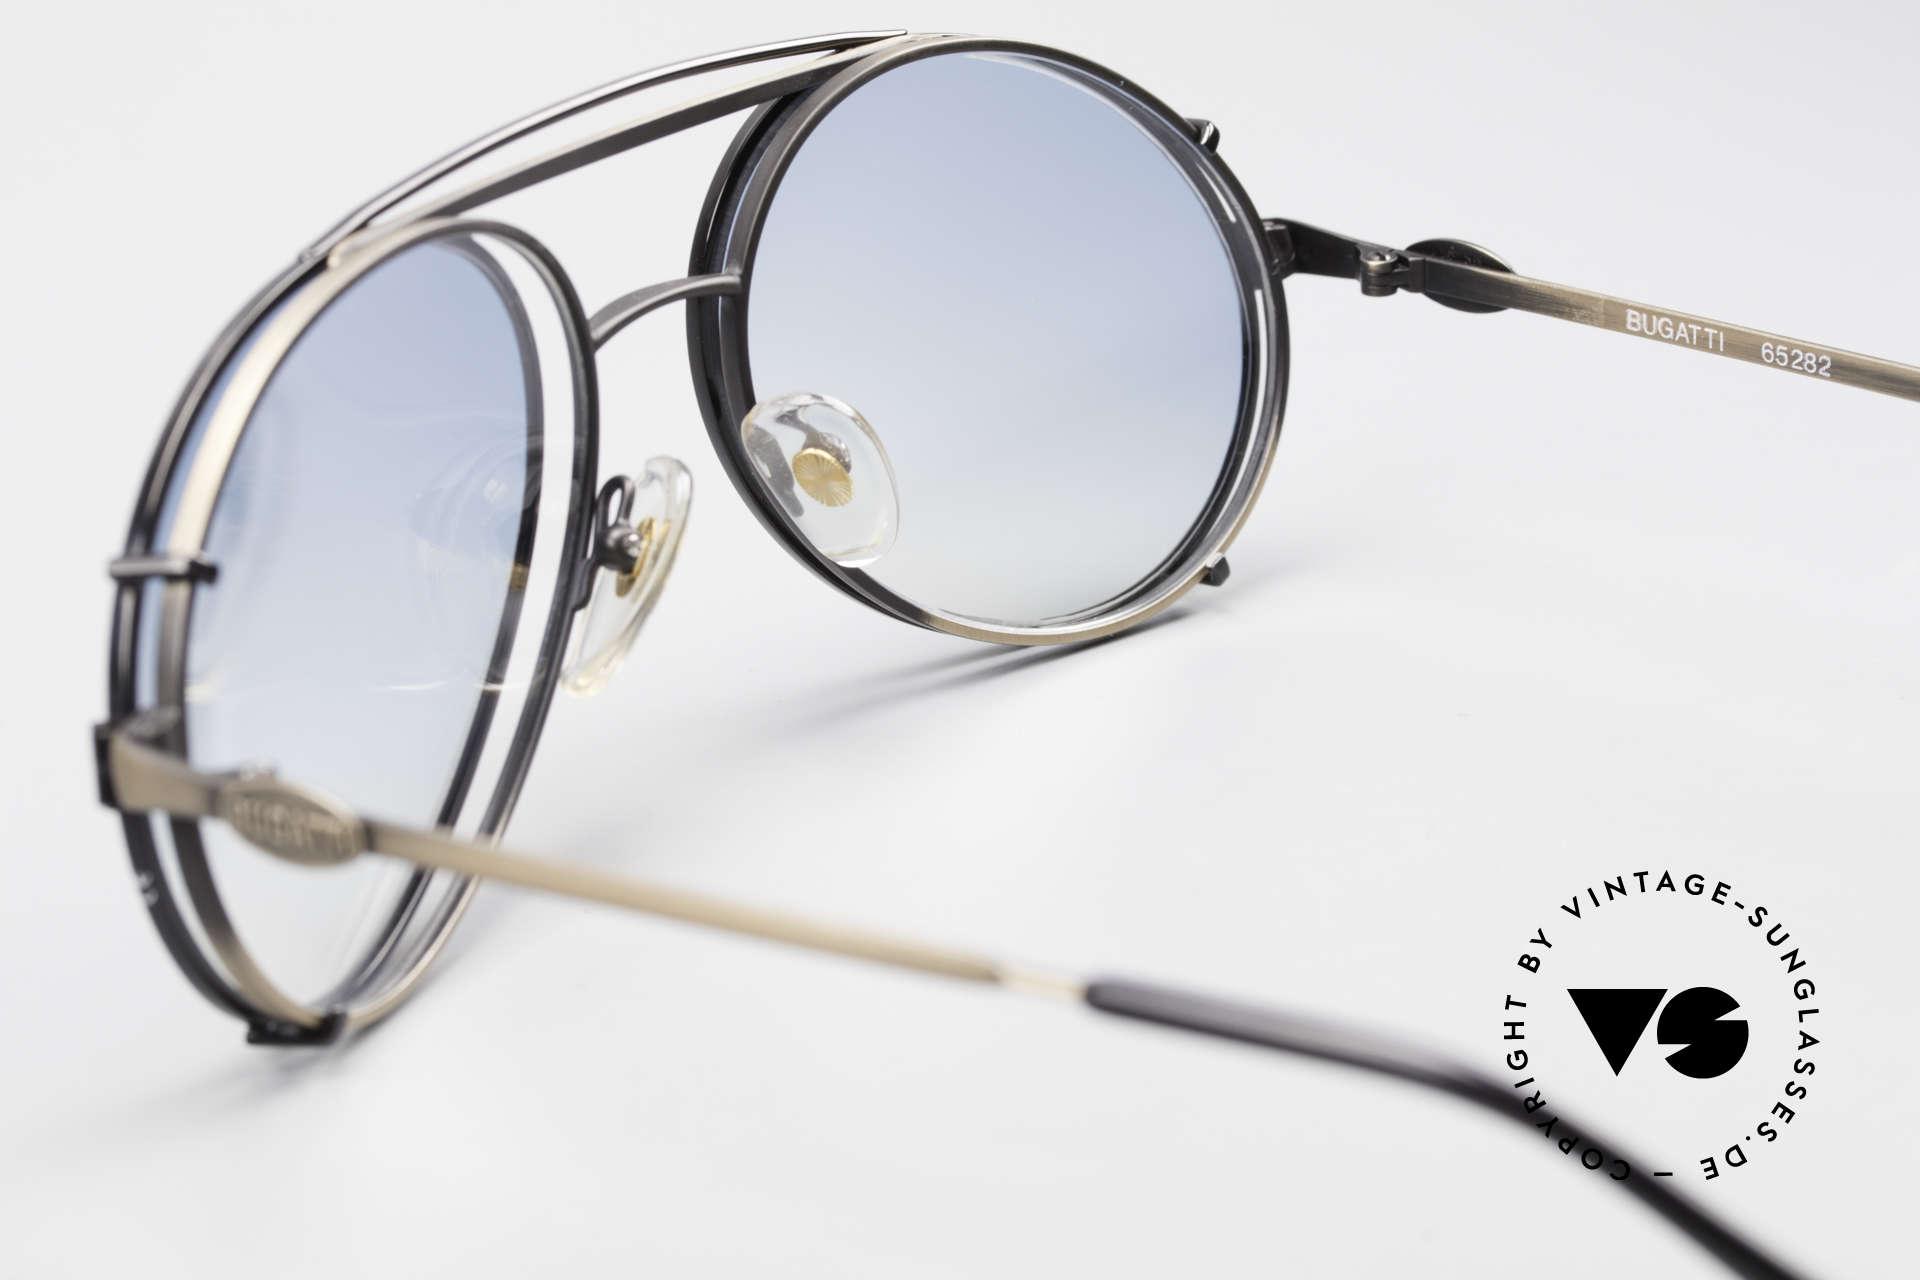 Bugatti 65282 Vintage Frame With Sun Clip, unworn; like all our vintage Bugatti sunglasses, Made for Men